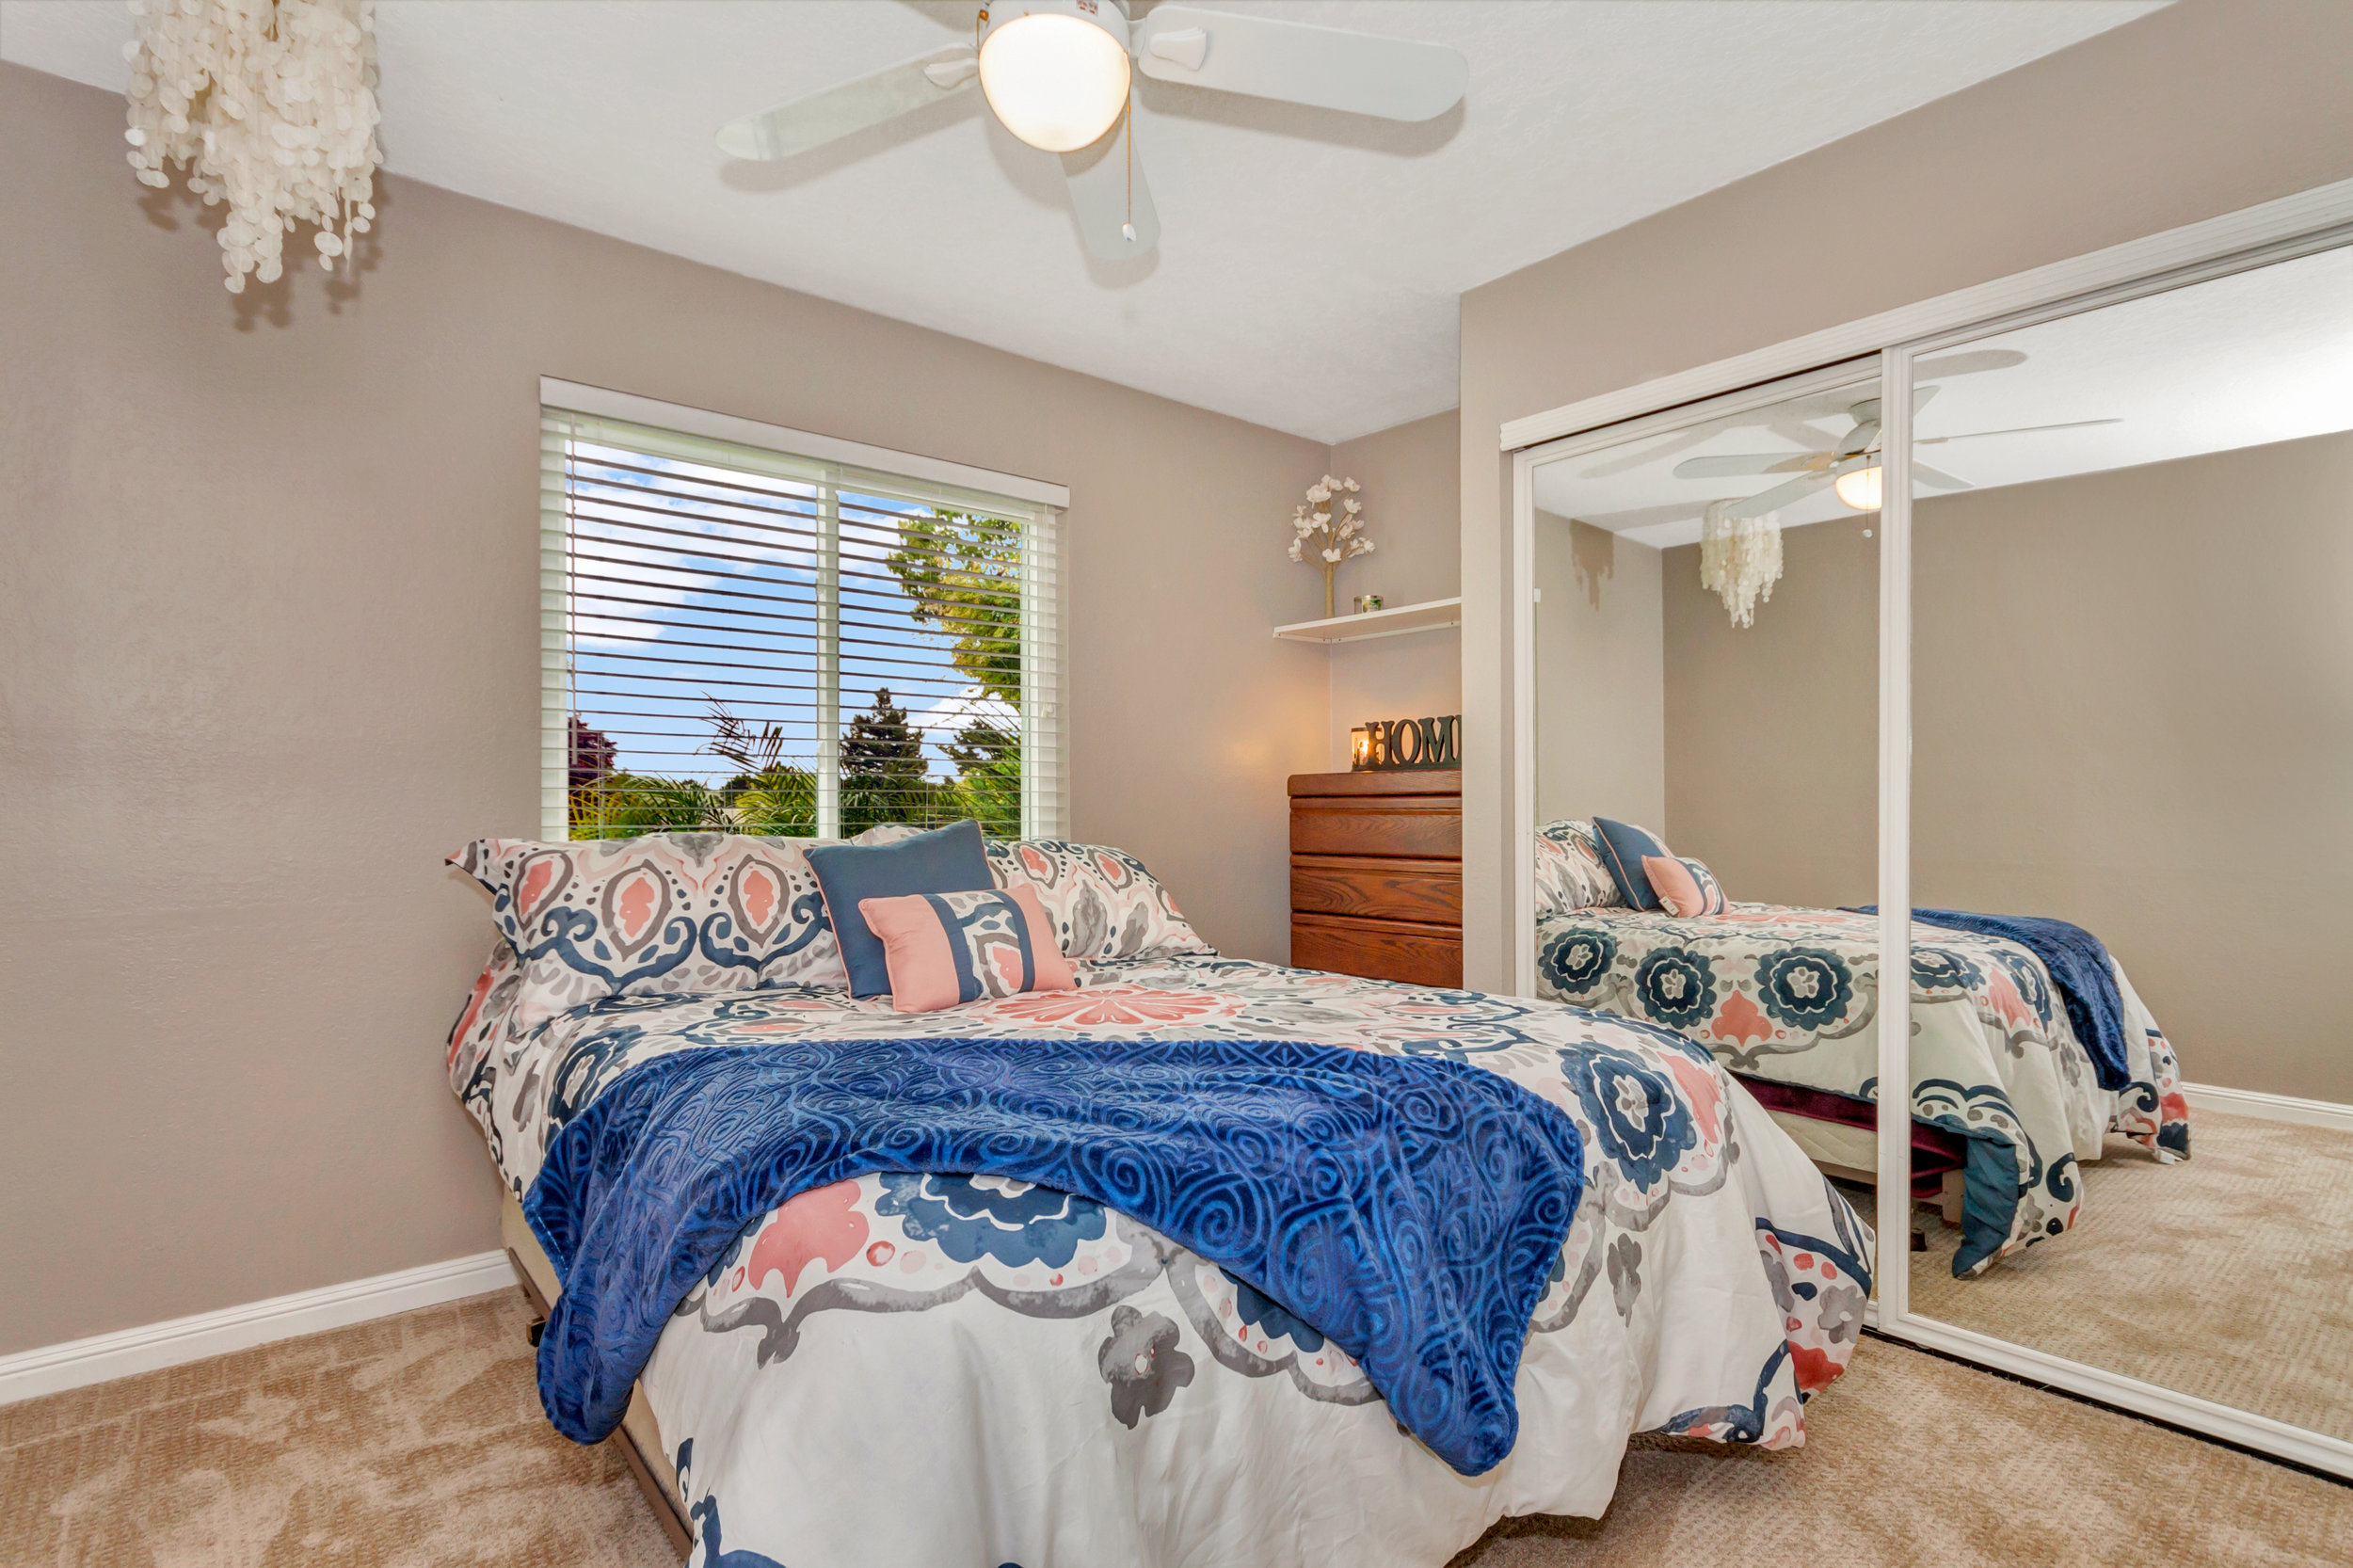 508 Poppy Circle Benicia CA-print-020-29-Second Bedroom 1a-4200x2800-300dpi.jpg